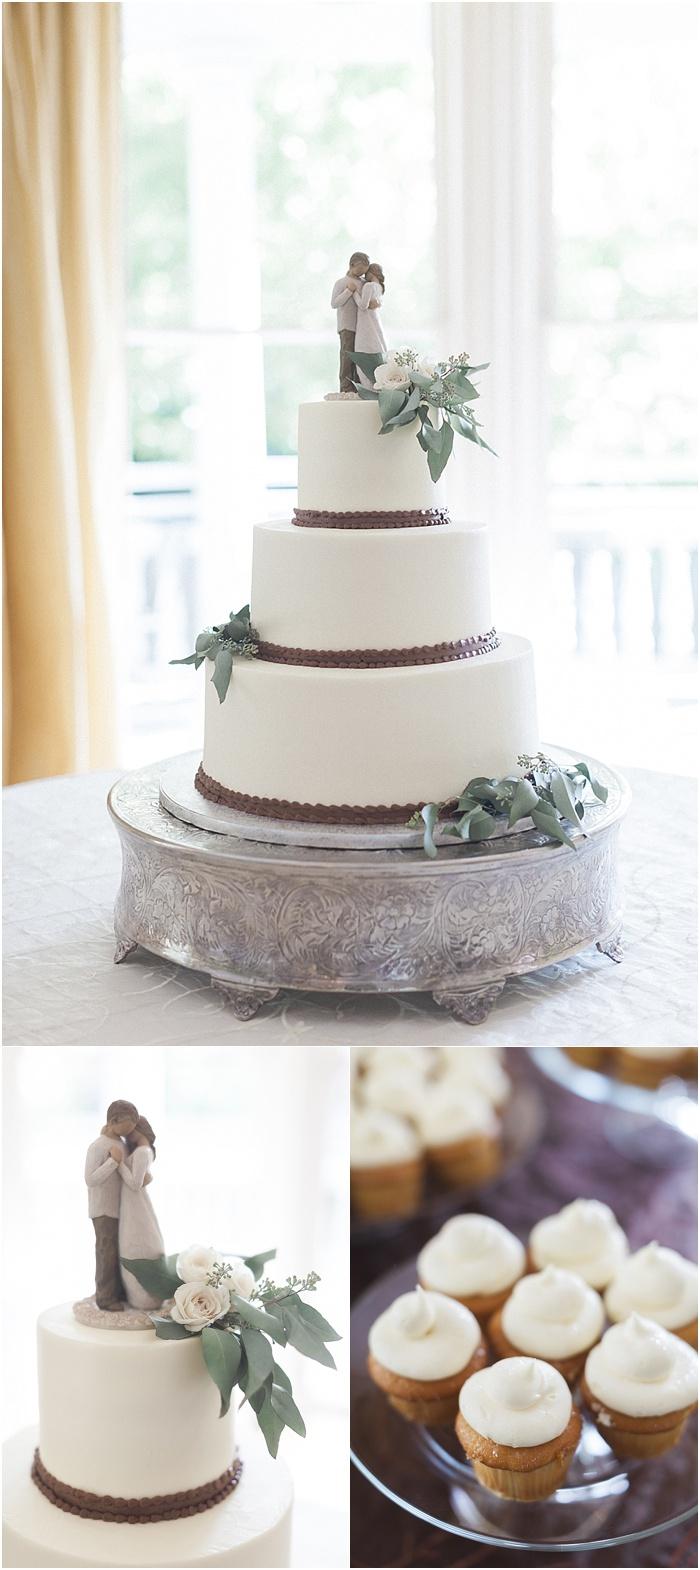 29_birmingham wedding photographer.jpeg